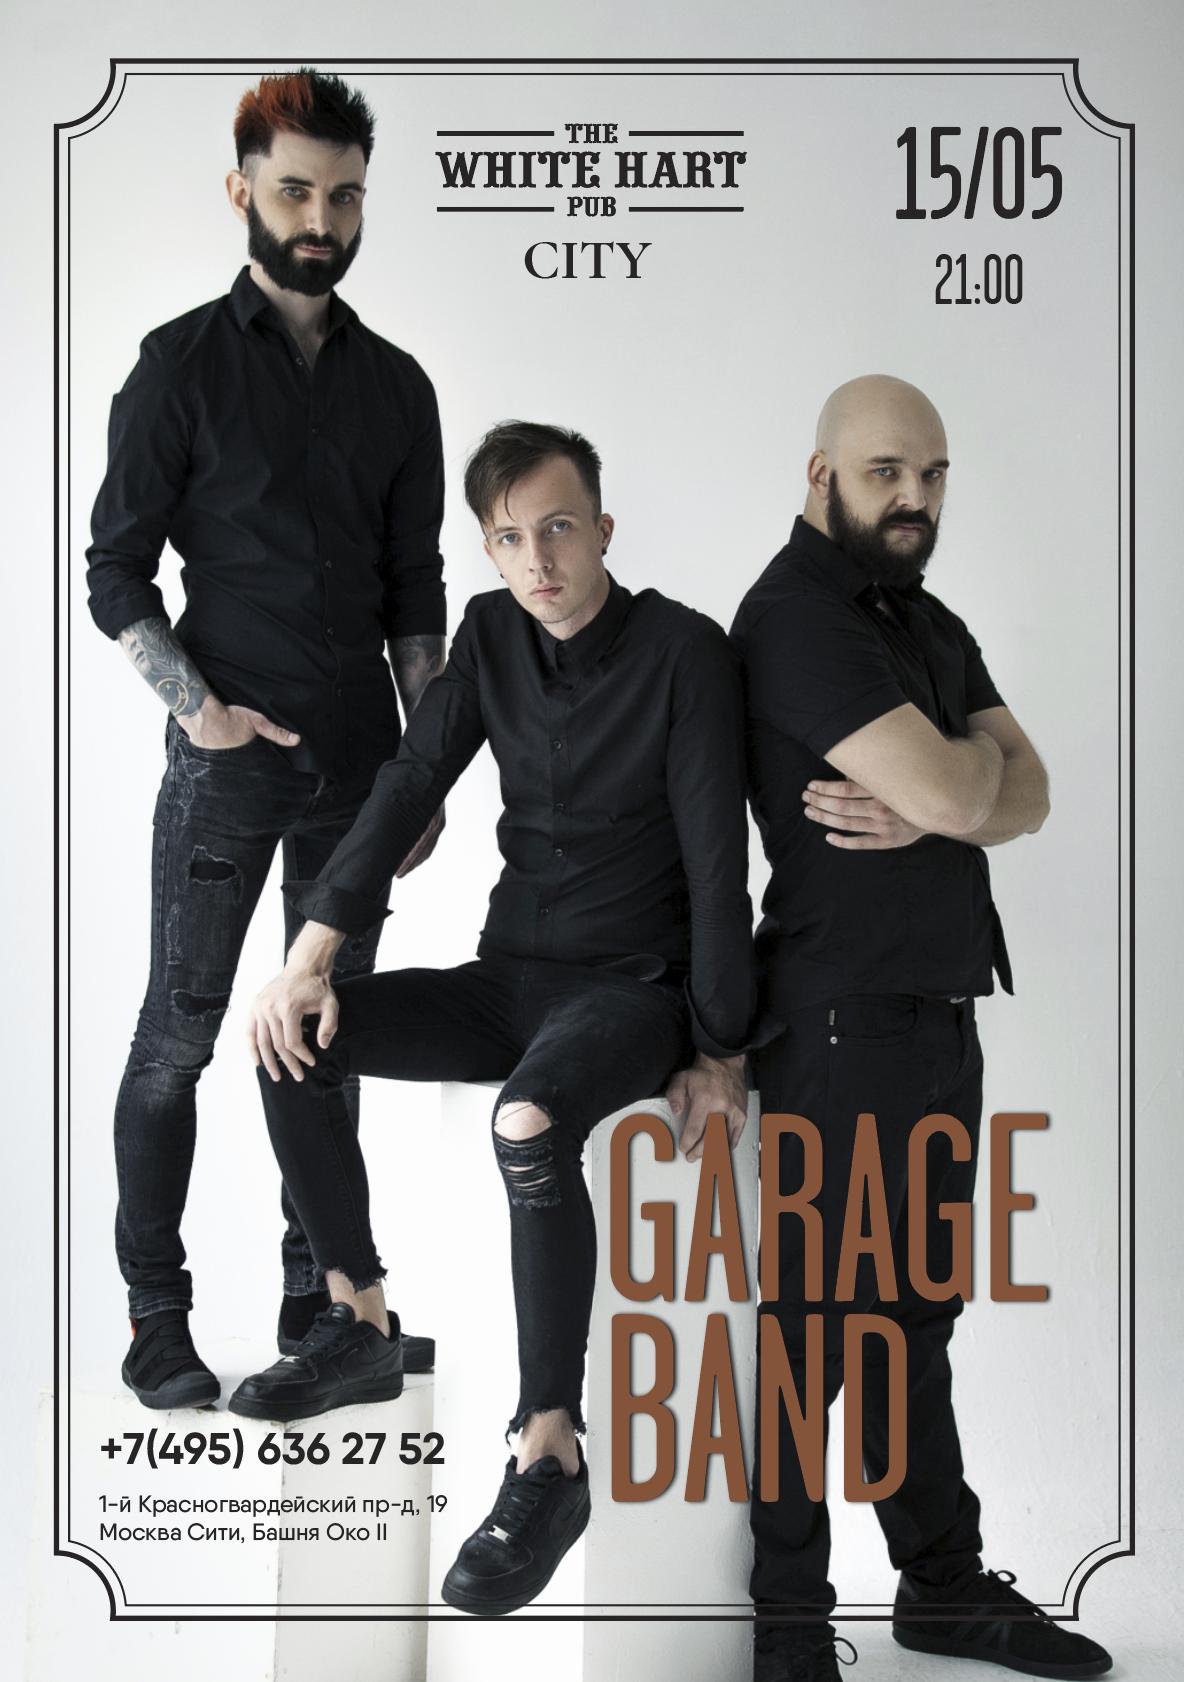 Афиша! 15 Мая — Кавер группа Garage Band  в White Hart Pub Moscow City